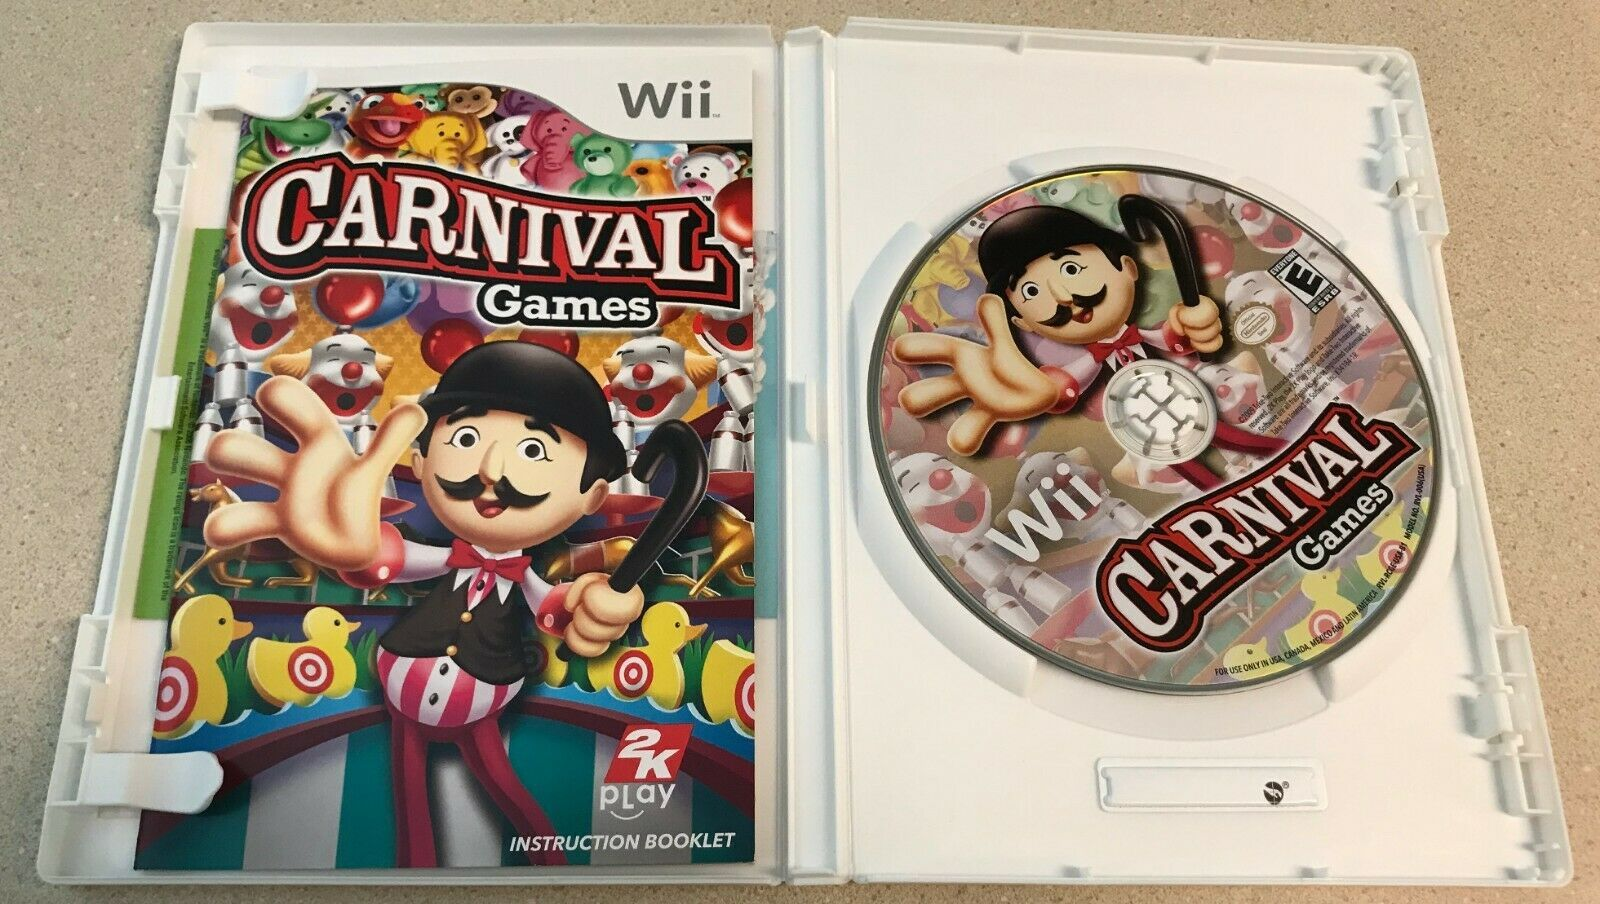 Carnival Games (Nintendo Wii, 2007) Game image 3